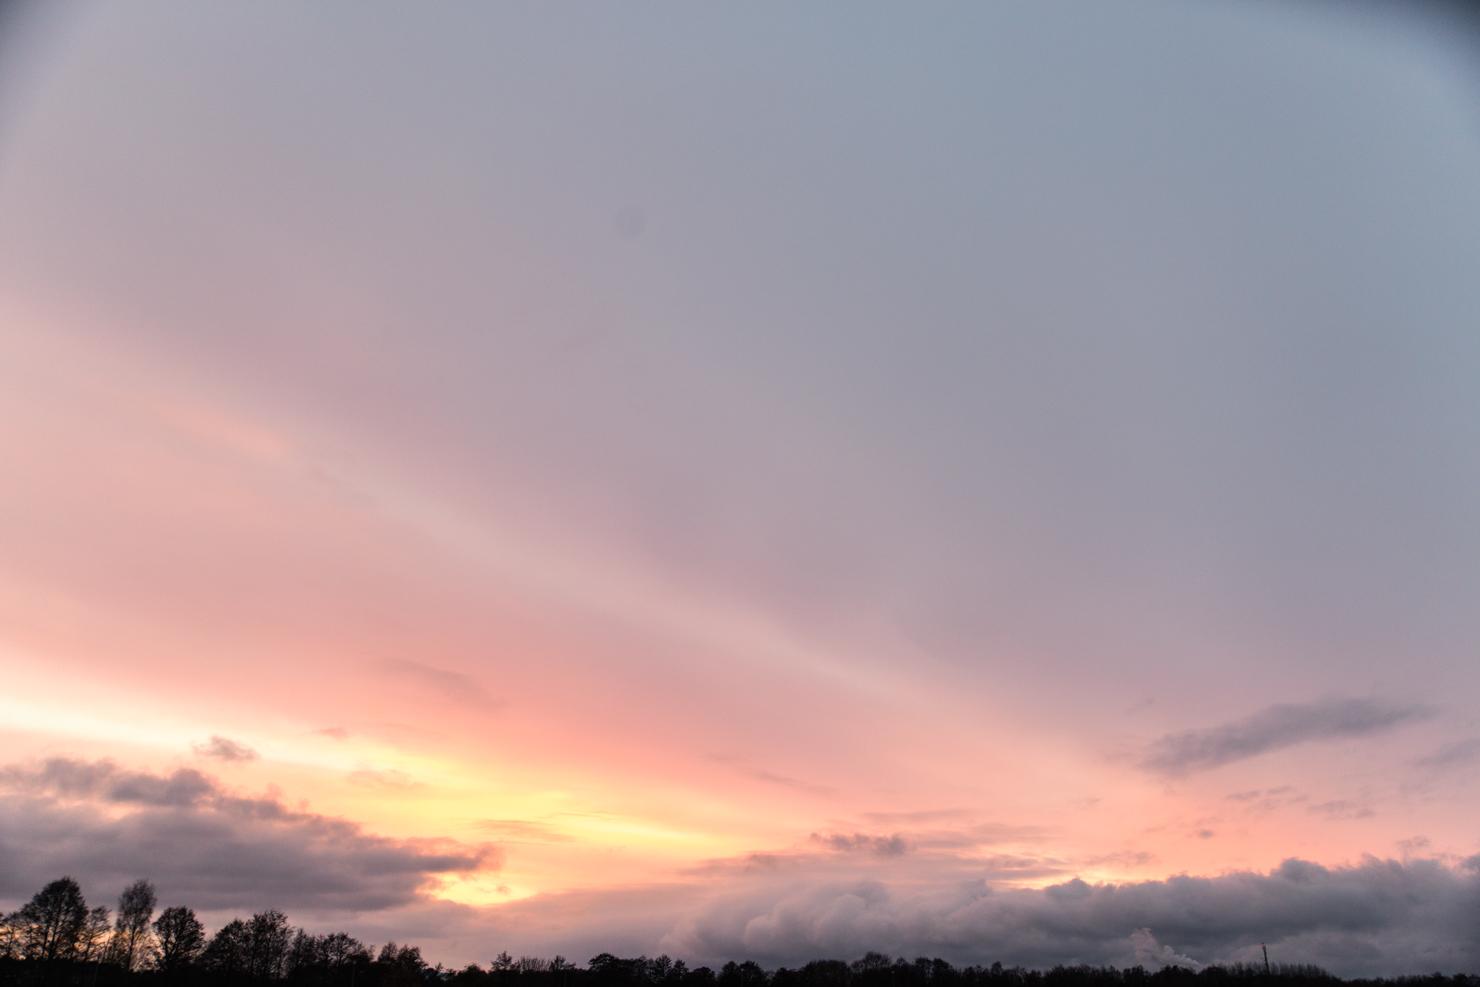 solnedgang-himmelstalund